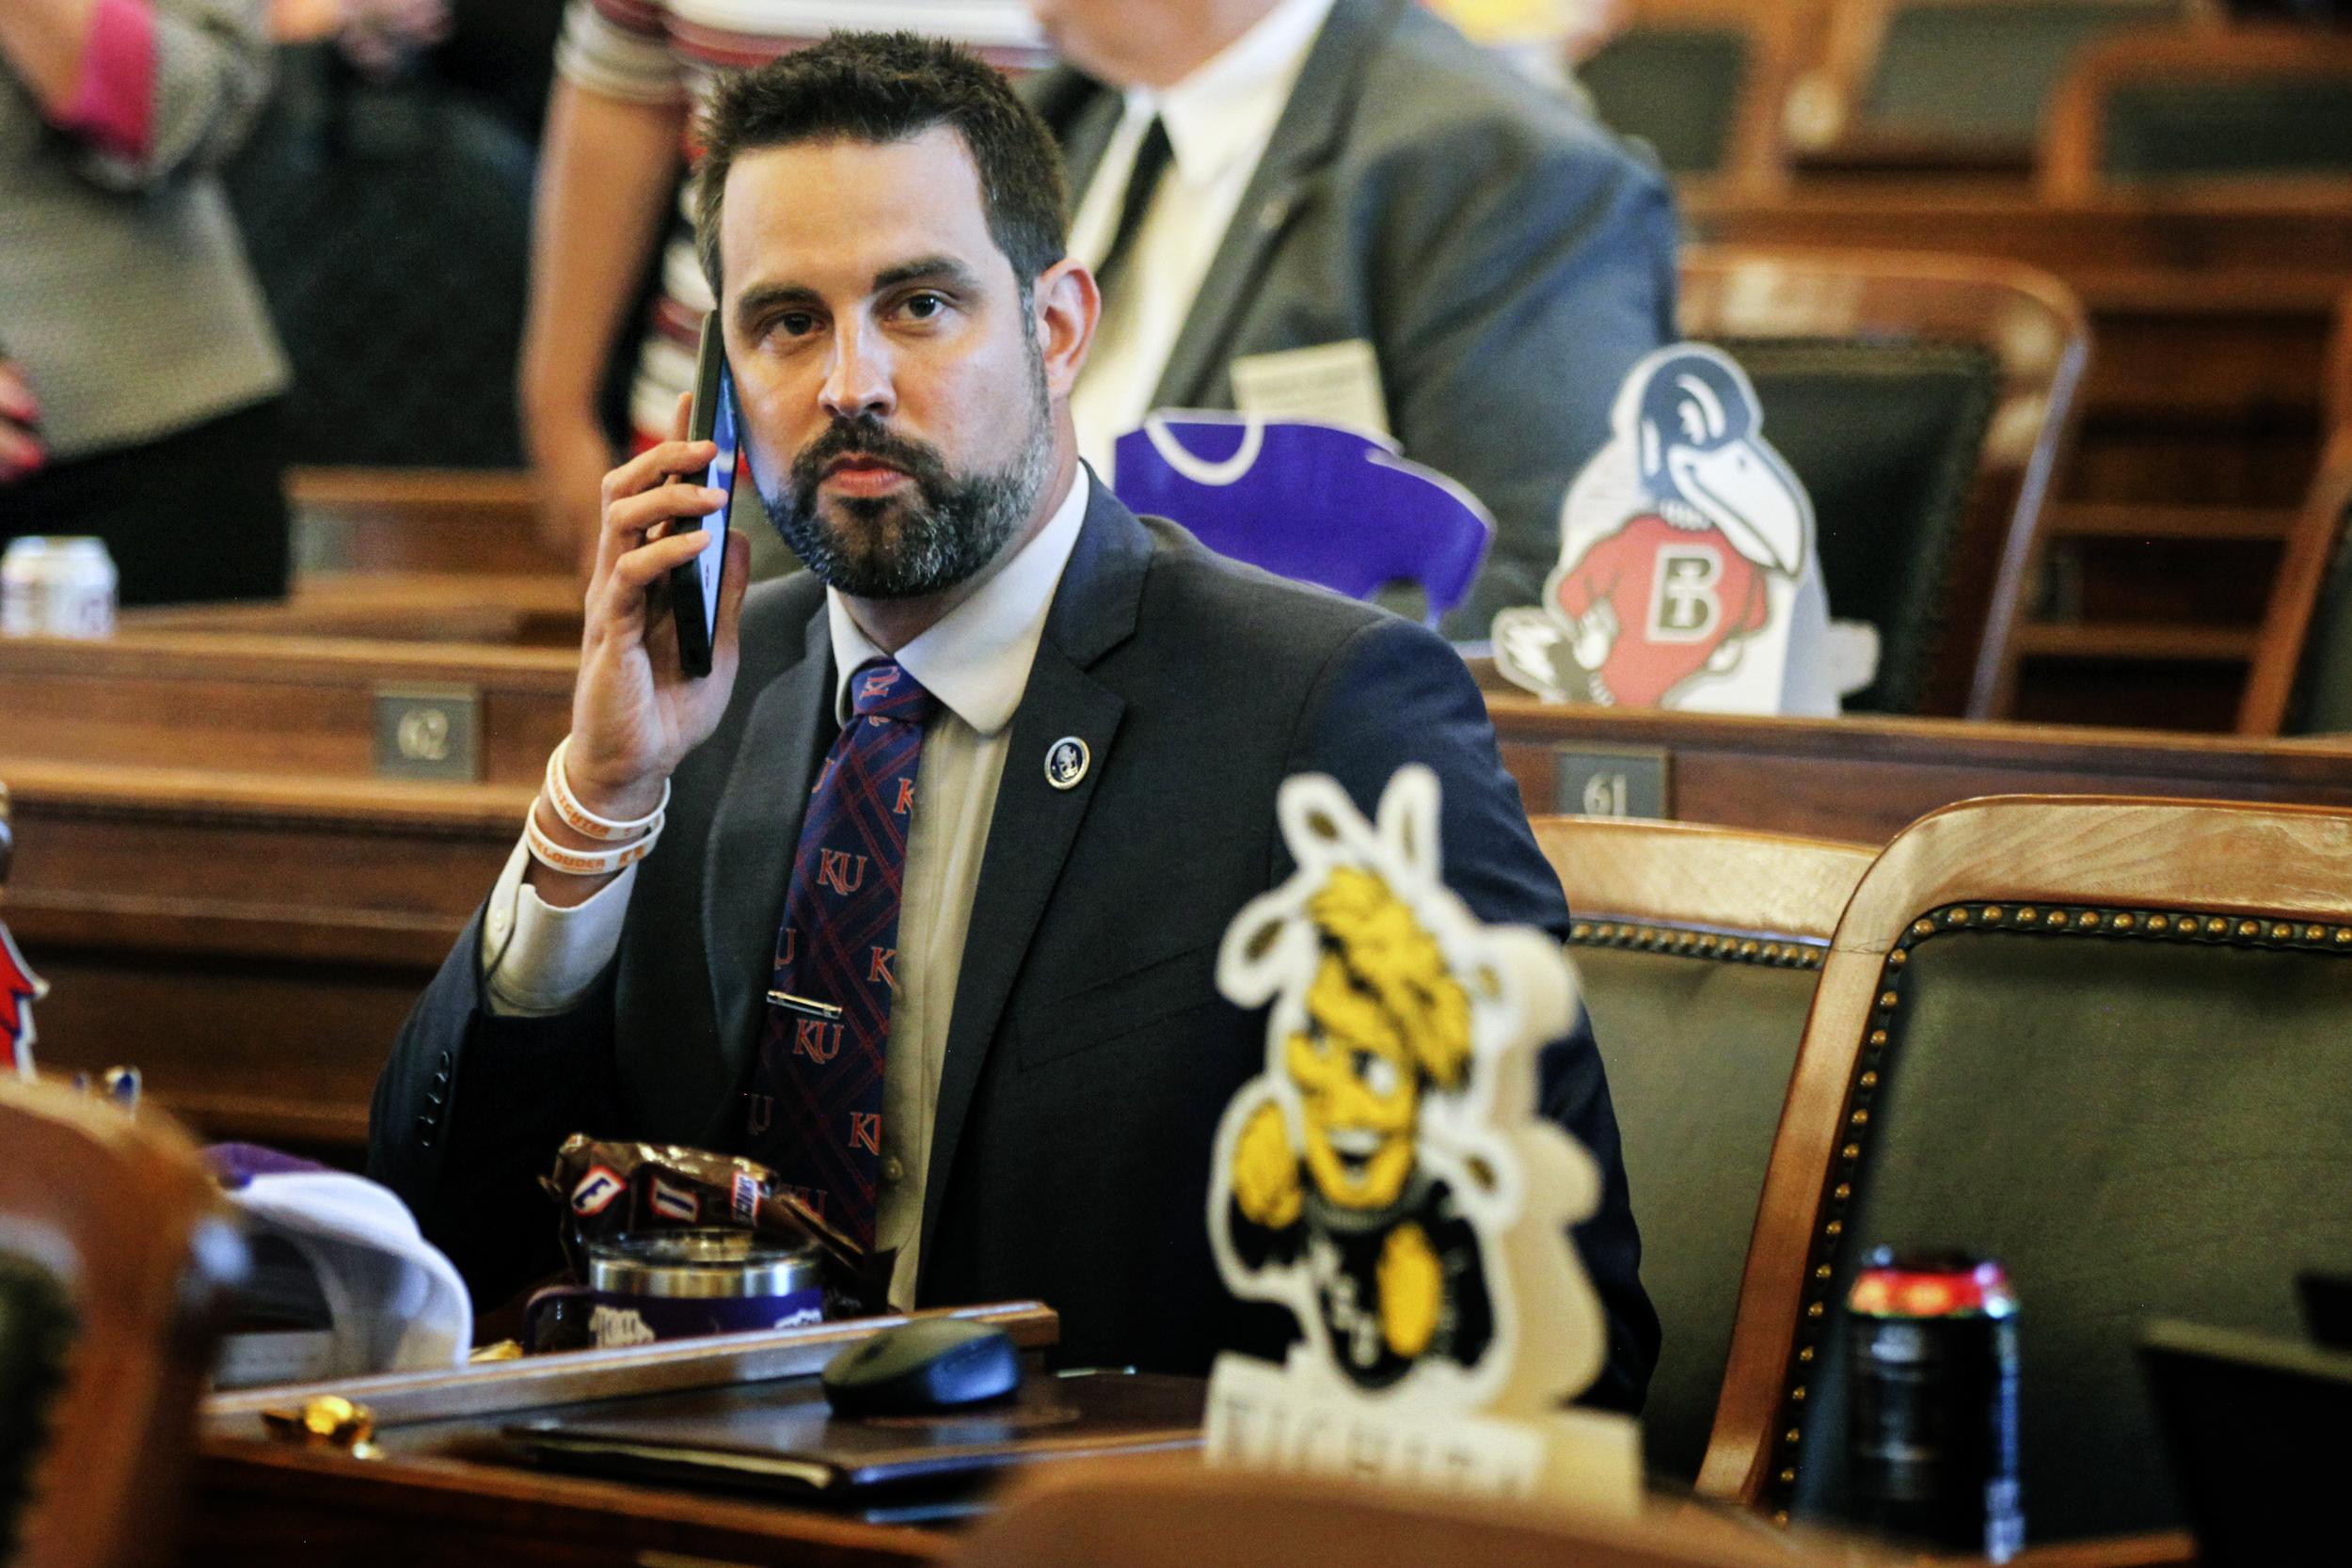 Kansas lawmaker accused of kicking high school student in groin surrenders teaching license